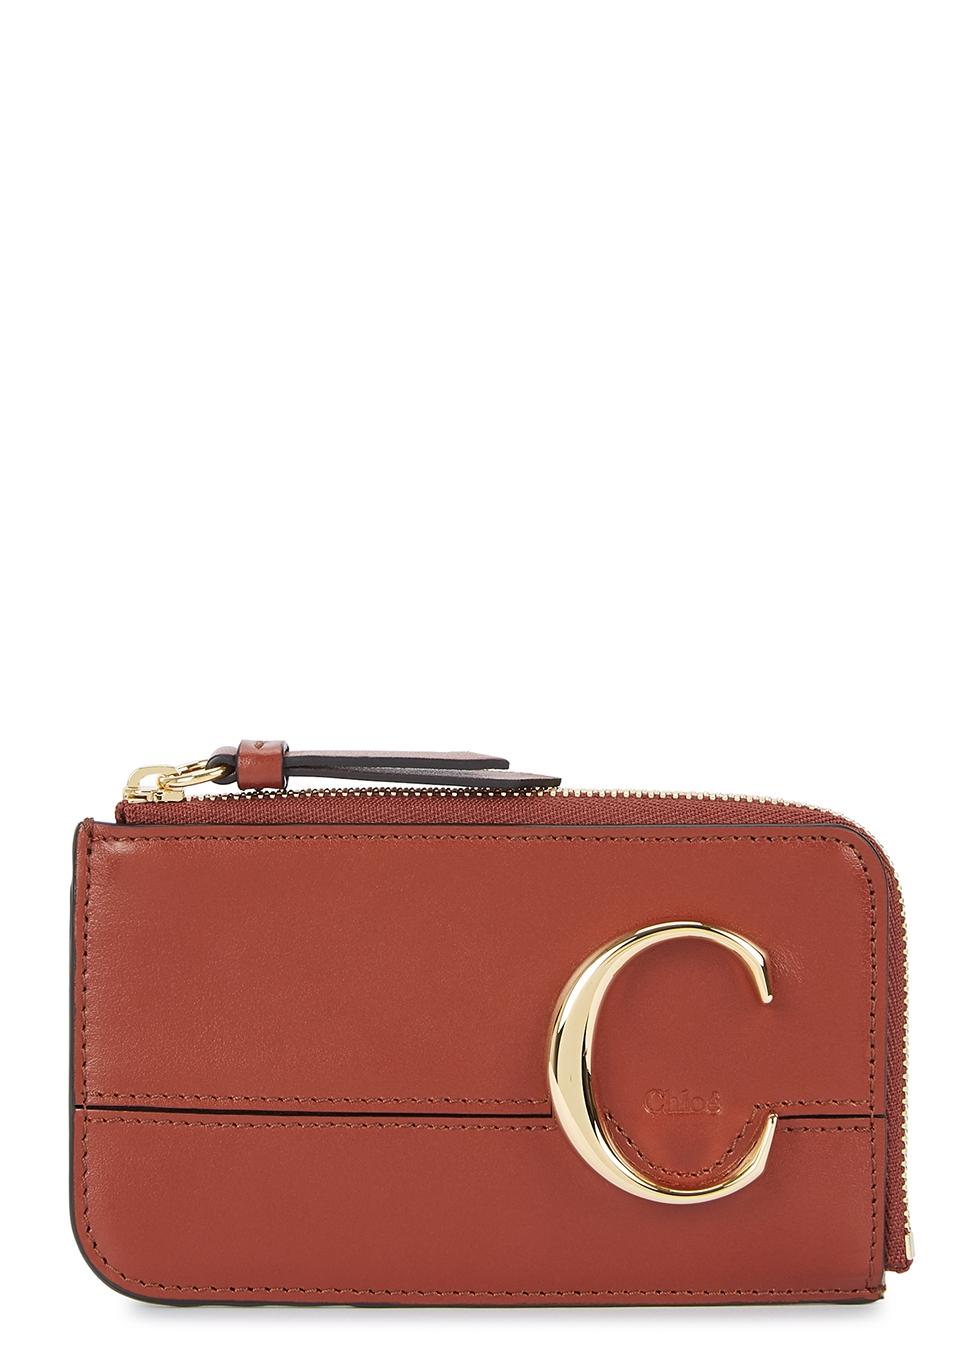 ee698ada76 Women's Designer Purses and Wallets - Harvey Nichols